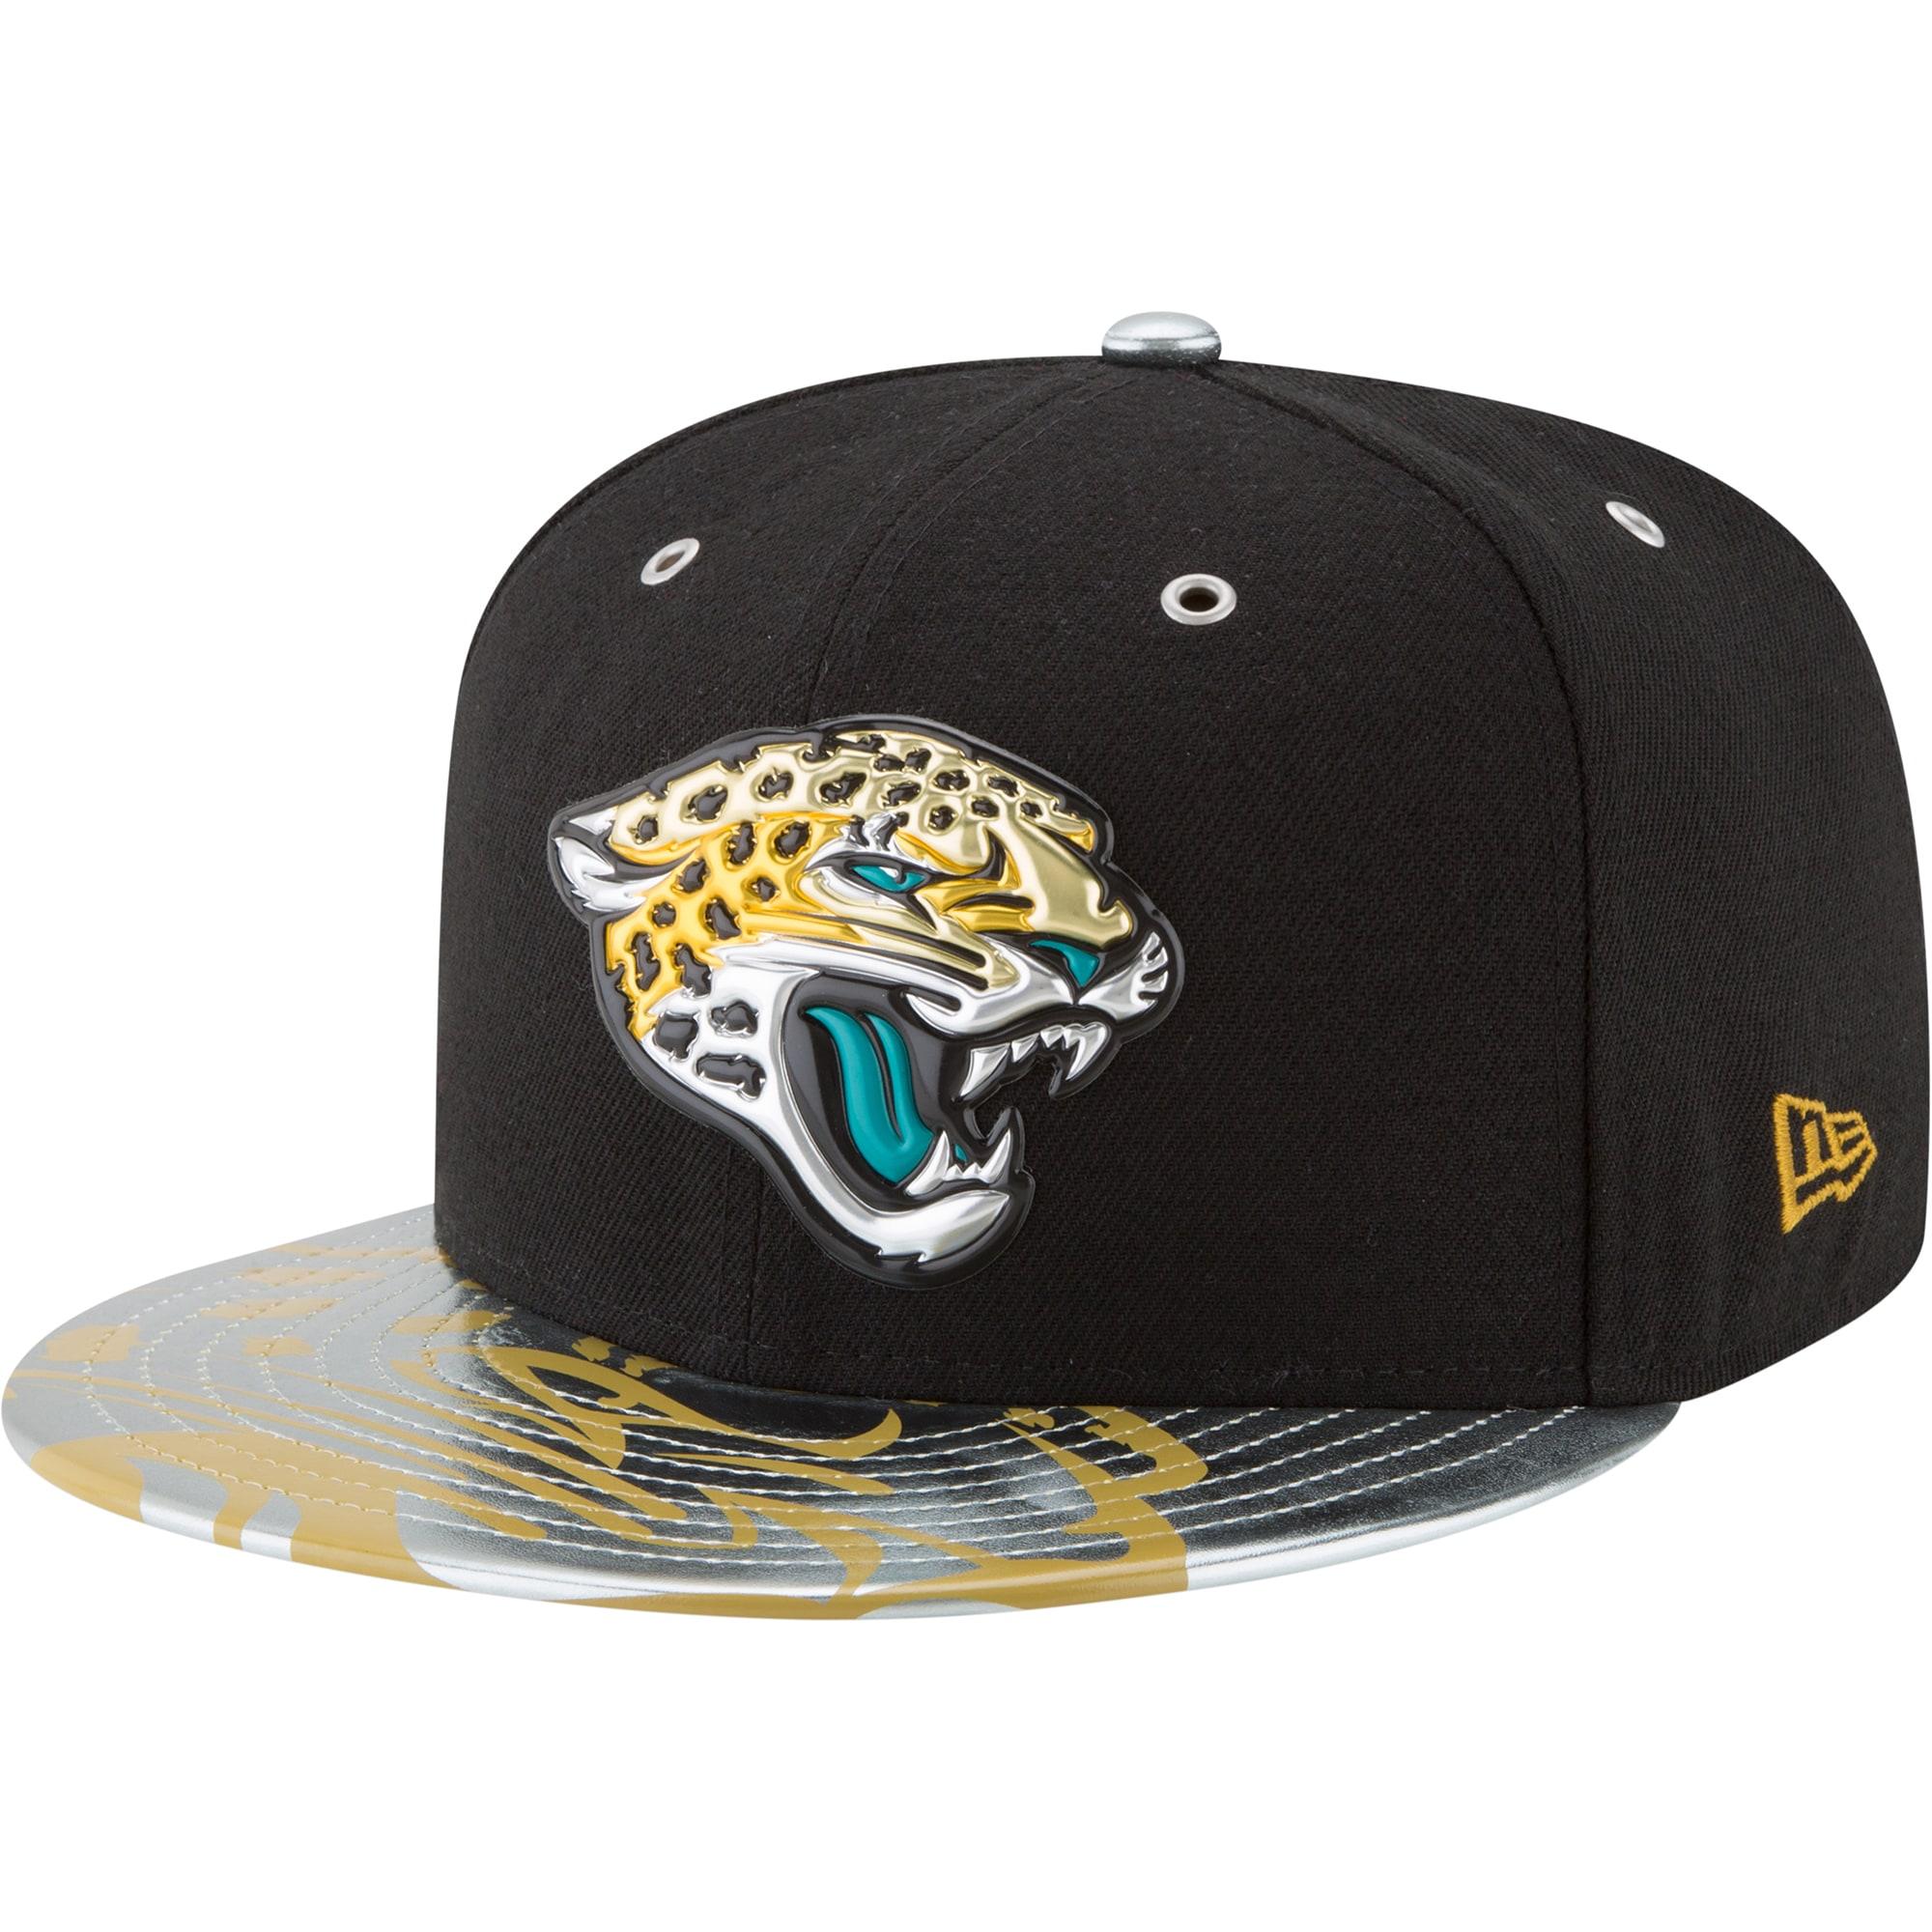 Jacksonville Jaguars New Era NFL Spotlight 59FIFTY Fitted Hat - Black